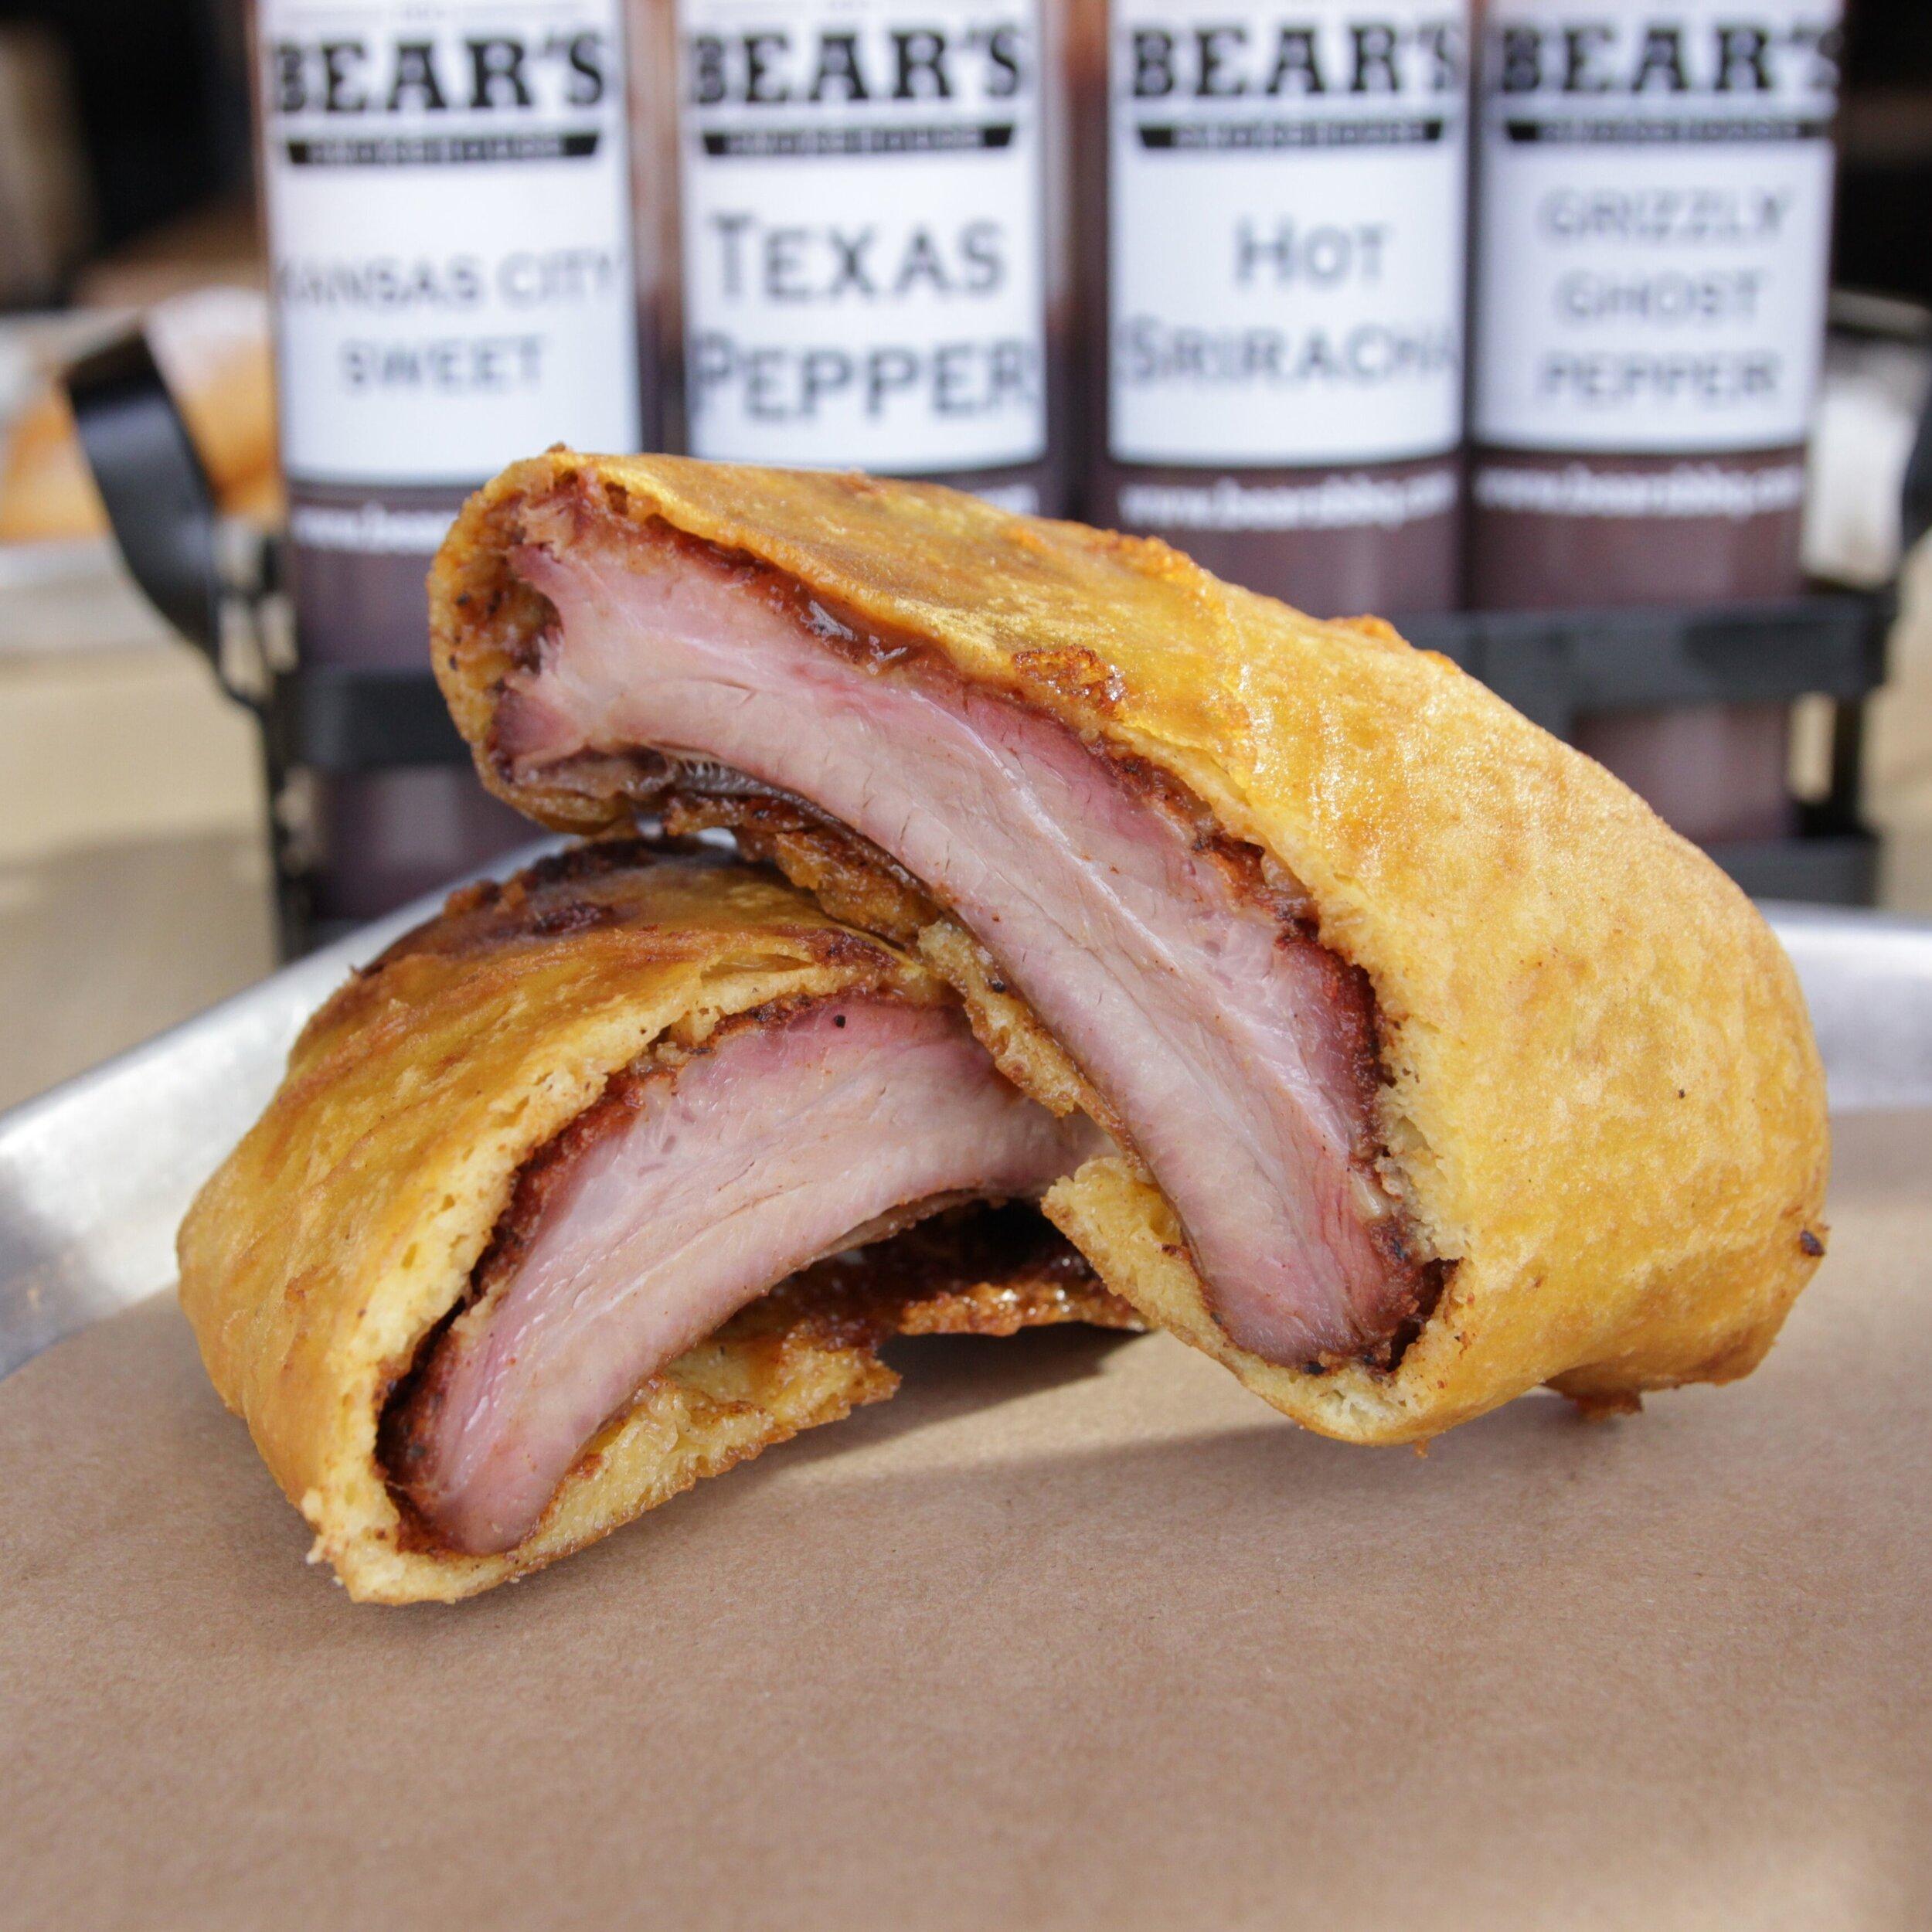 Crispy Ribs  - $7  Quarter rack of ribs, bettered and deep fried